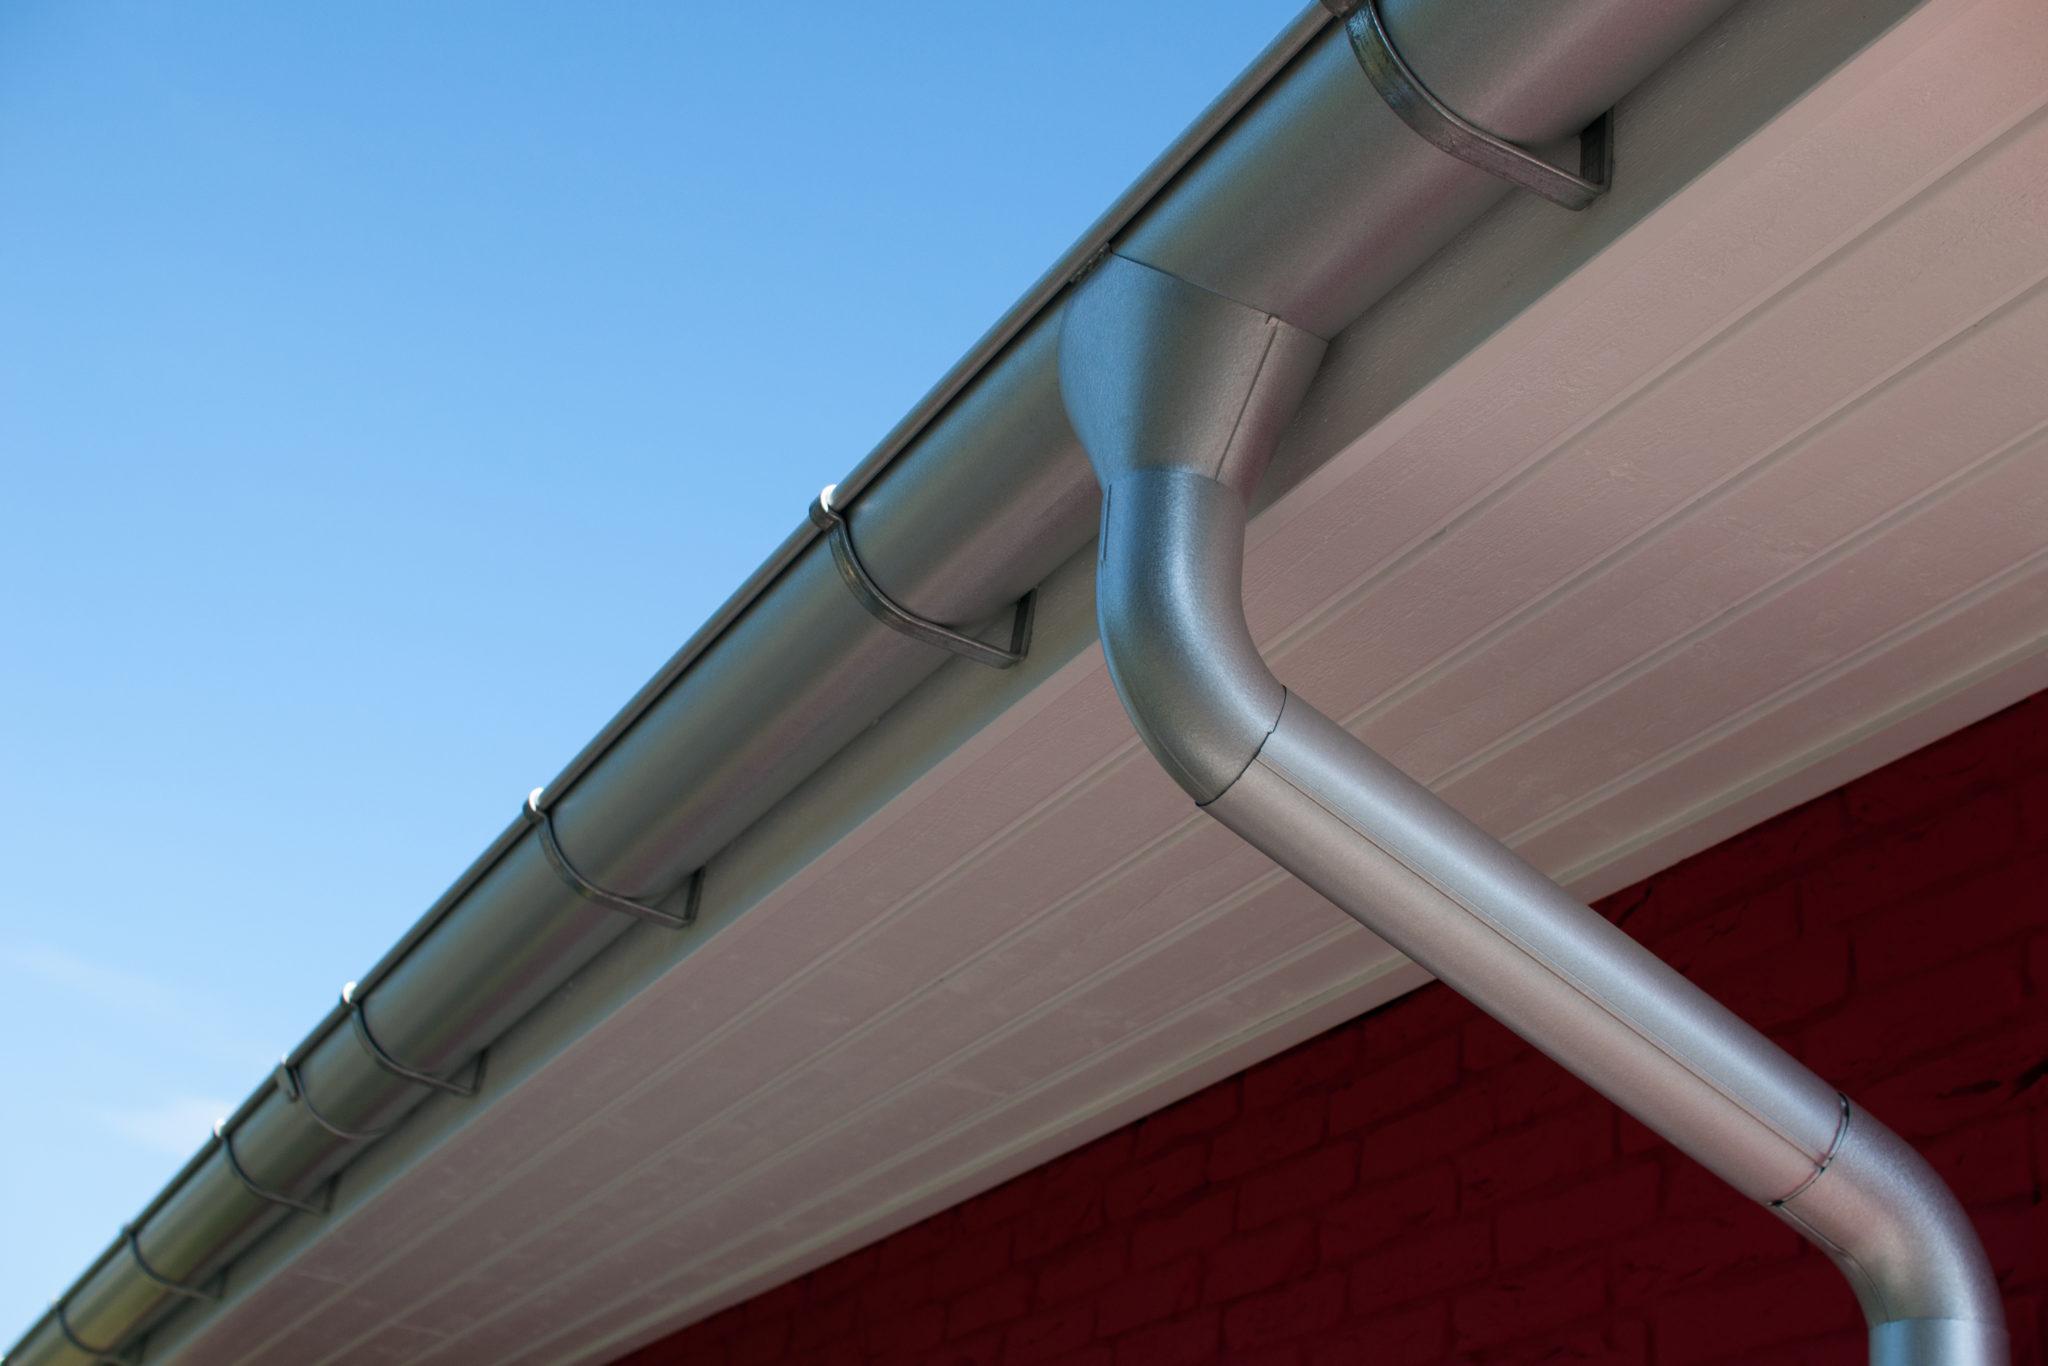 Guttering Rwdp Installation Ramchand Structural Steel Fabricating Co Ltd